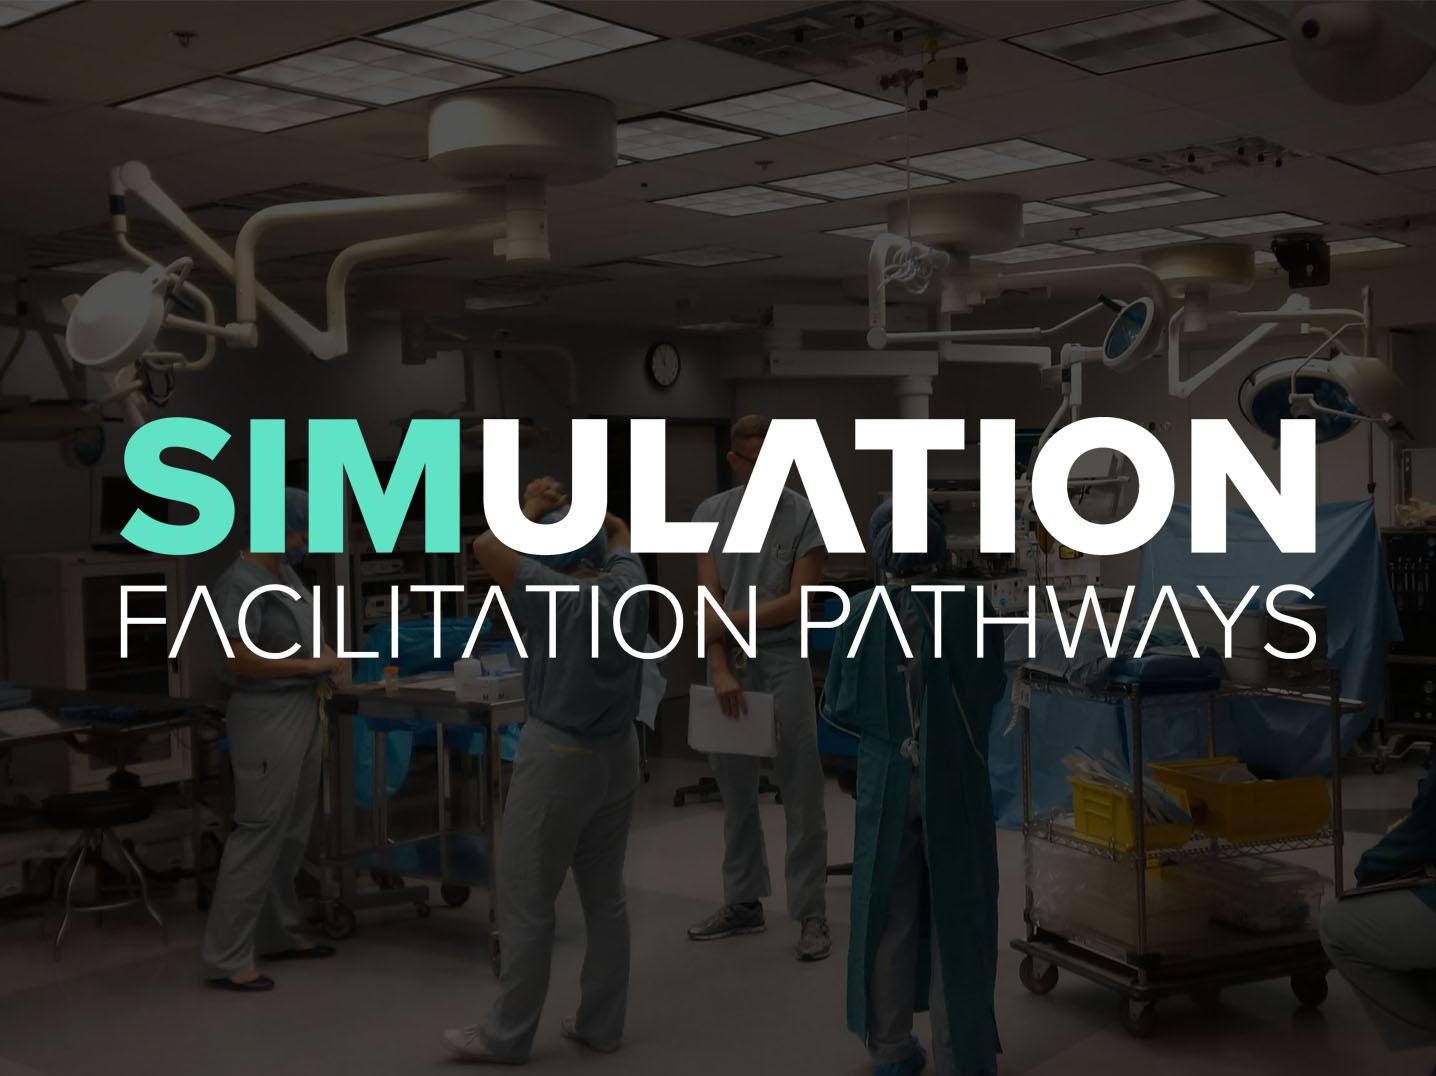 Simulation Facilitation Pathways